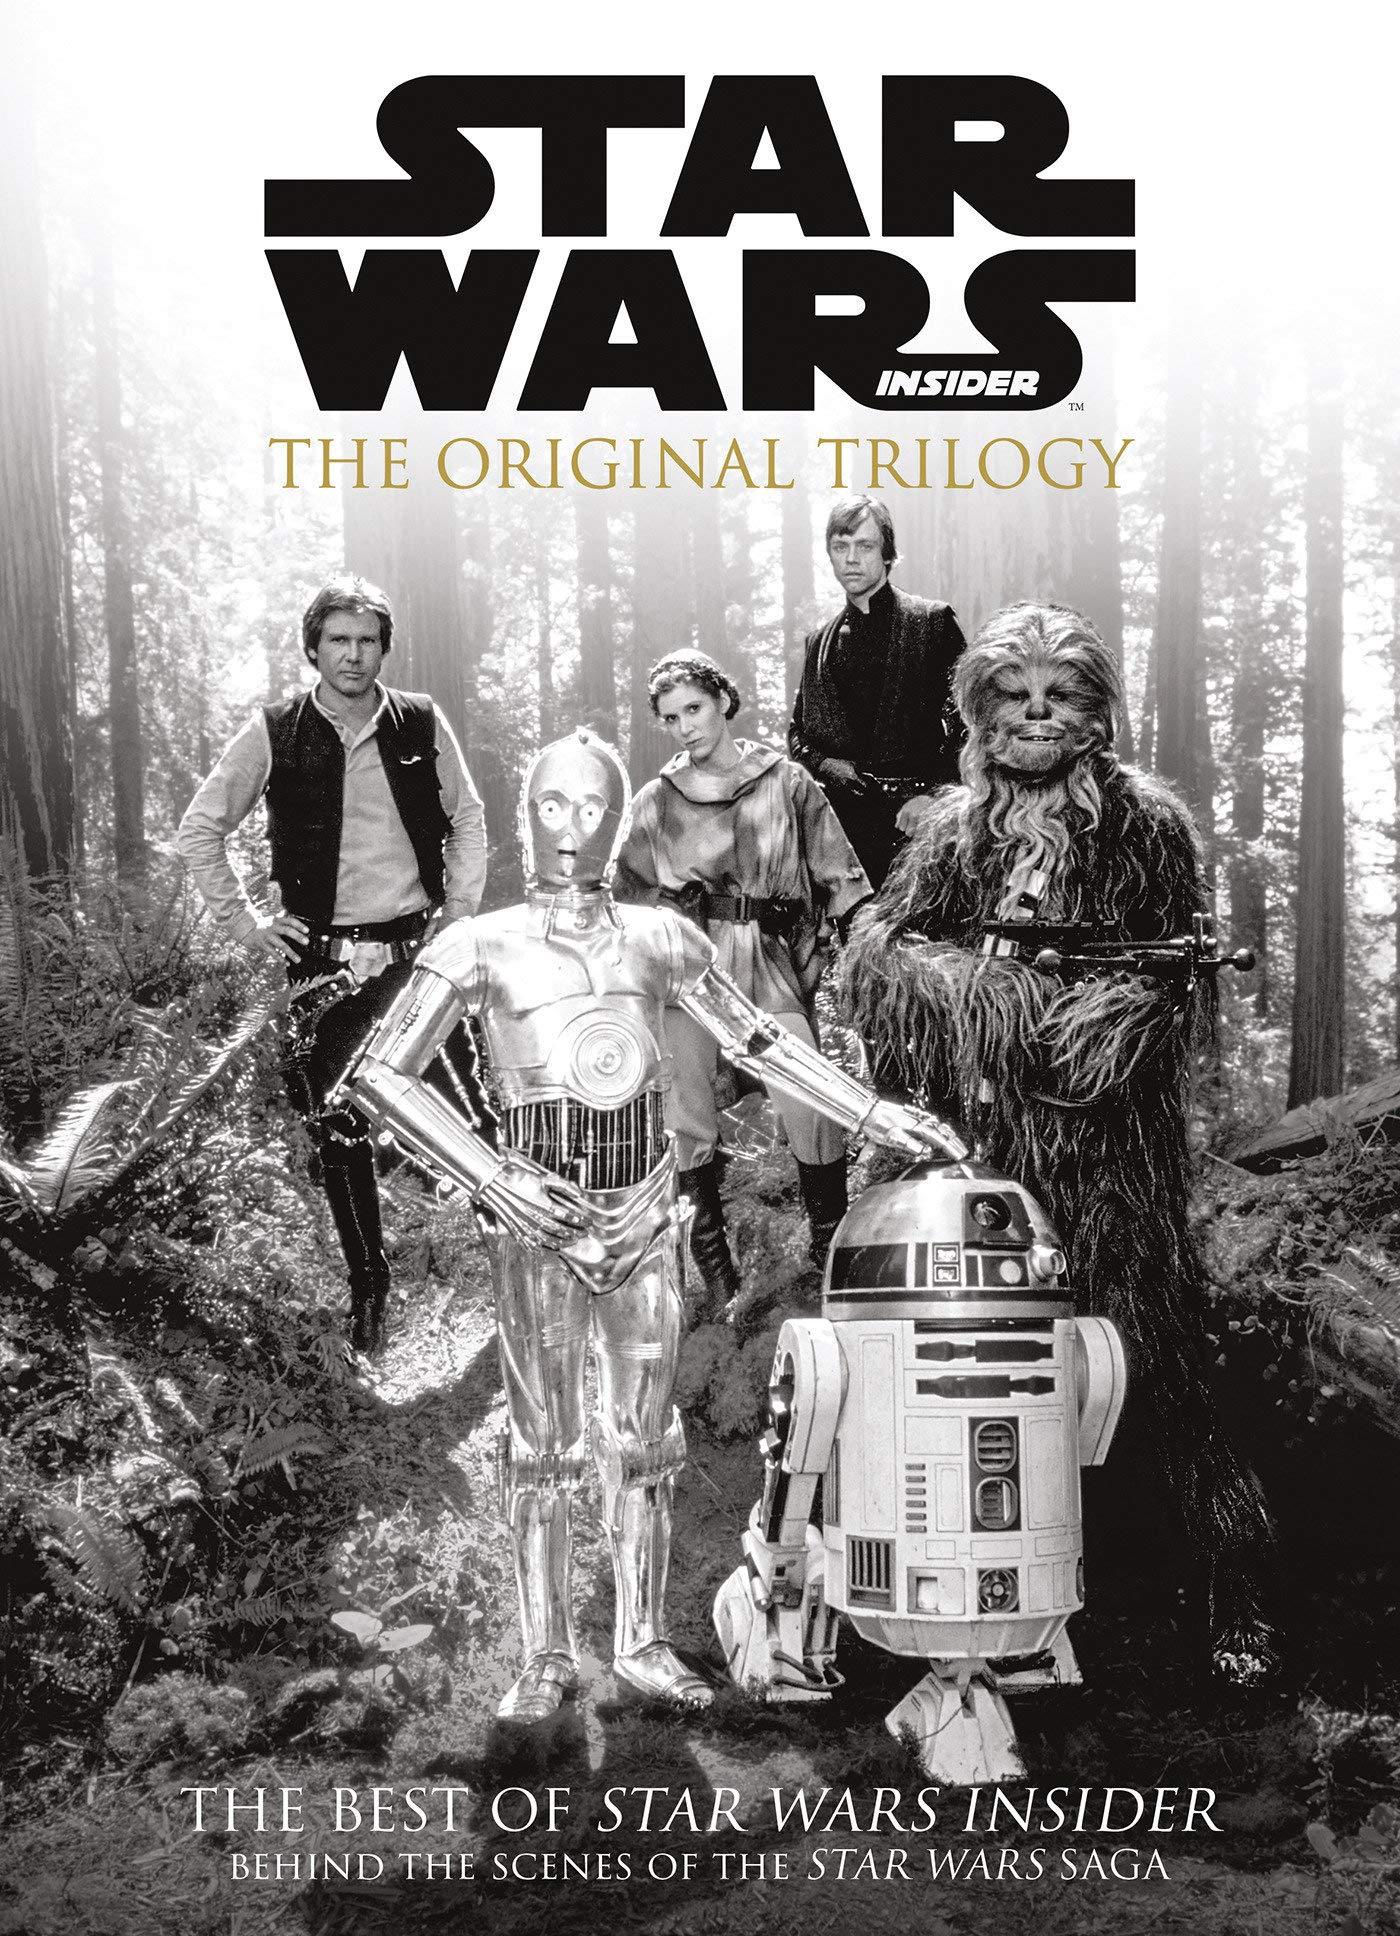 Star Wars Insider: The Original Trilogy (The Best of Star Wars Insider)